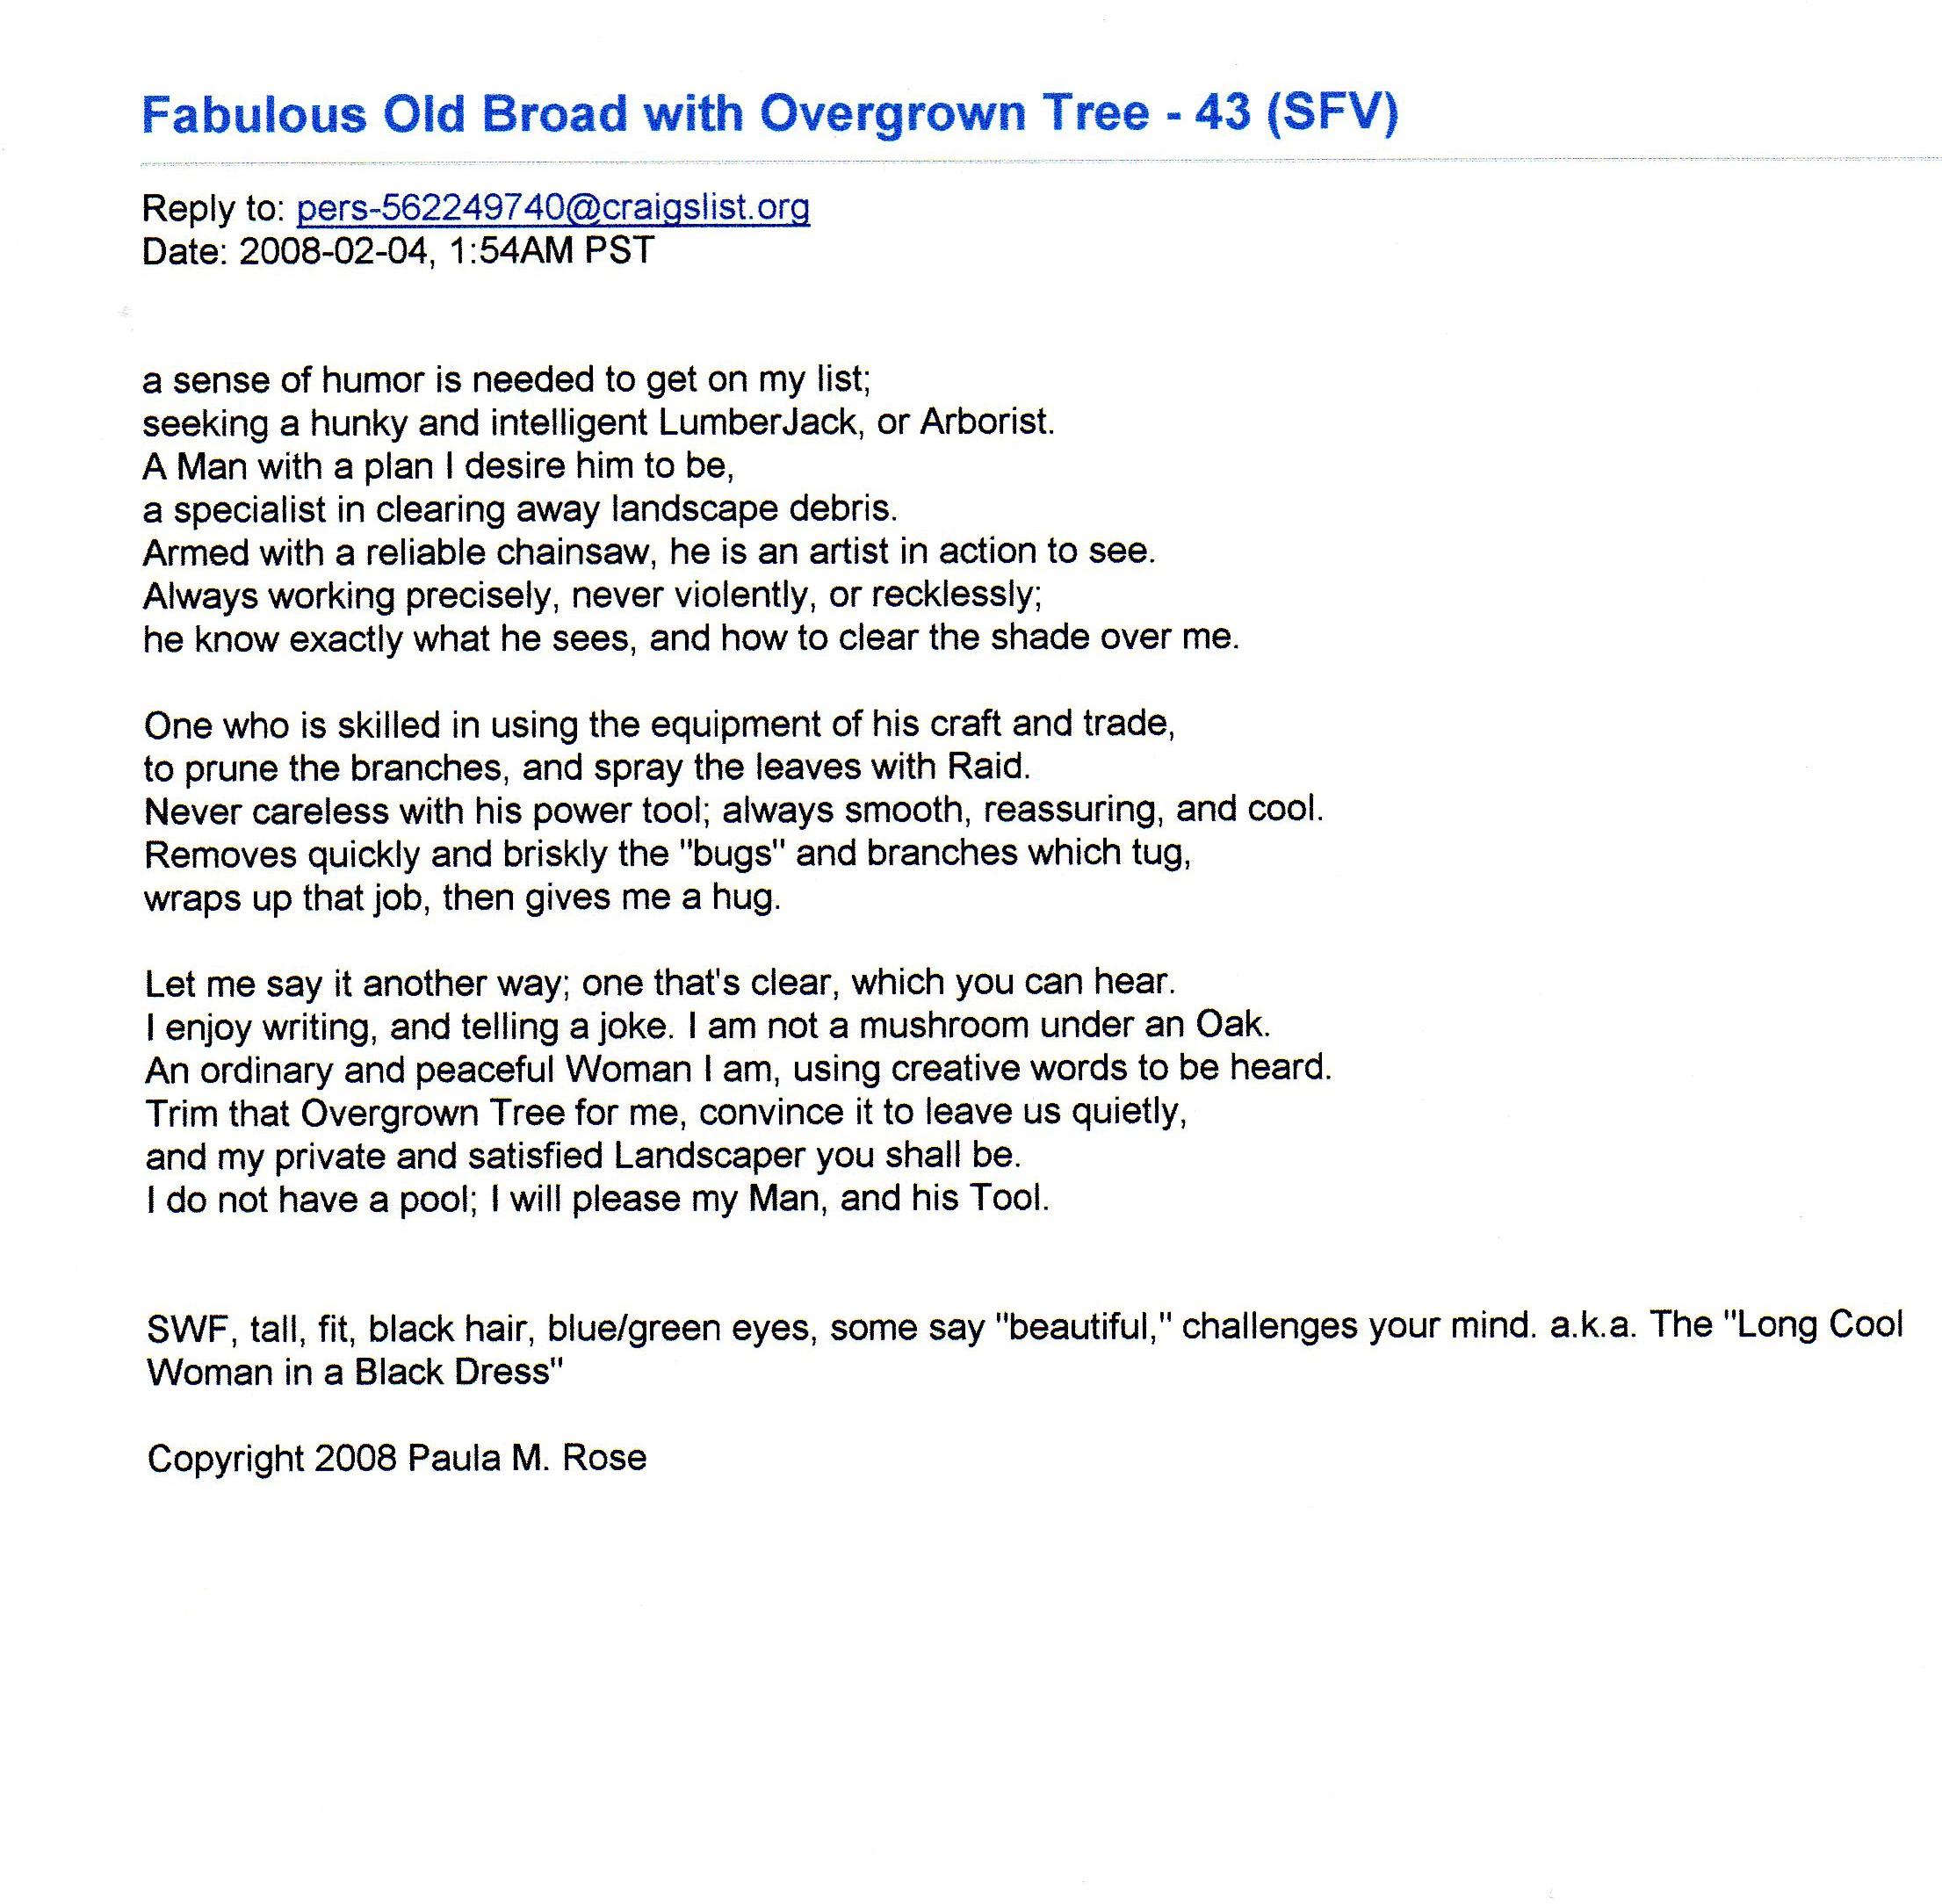 015 Poem 30 Fabulous Old Broad Do My Essay For Me Impressive Write Please Free Online Custom Cheap Full